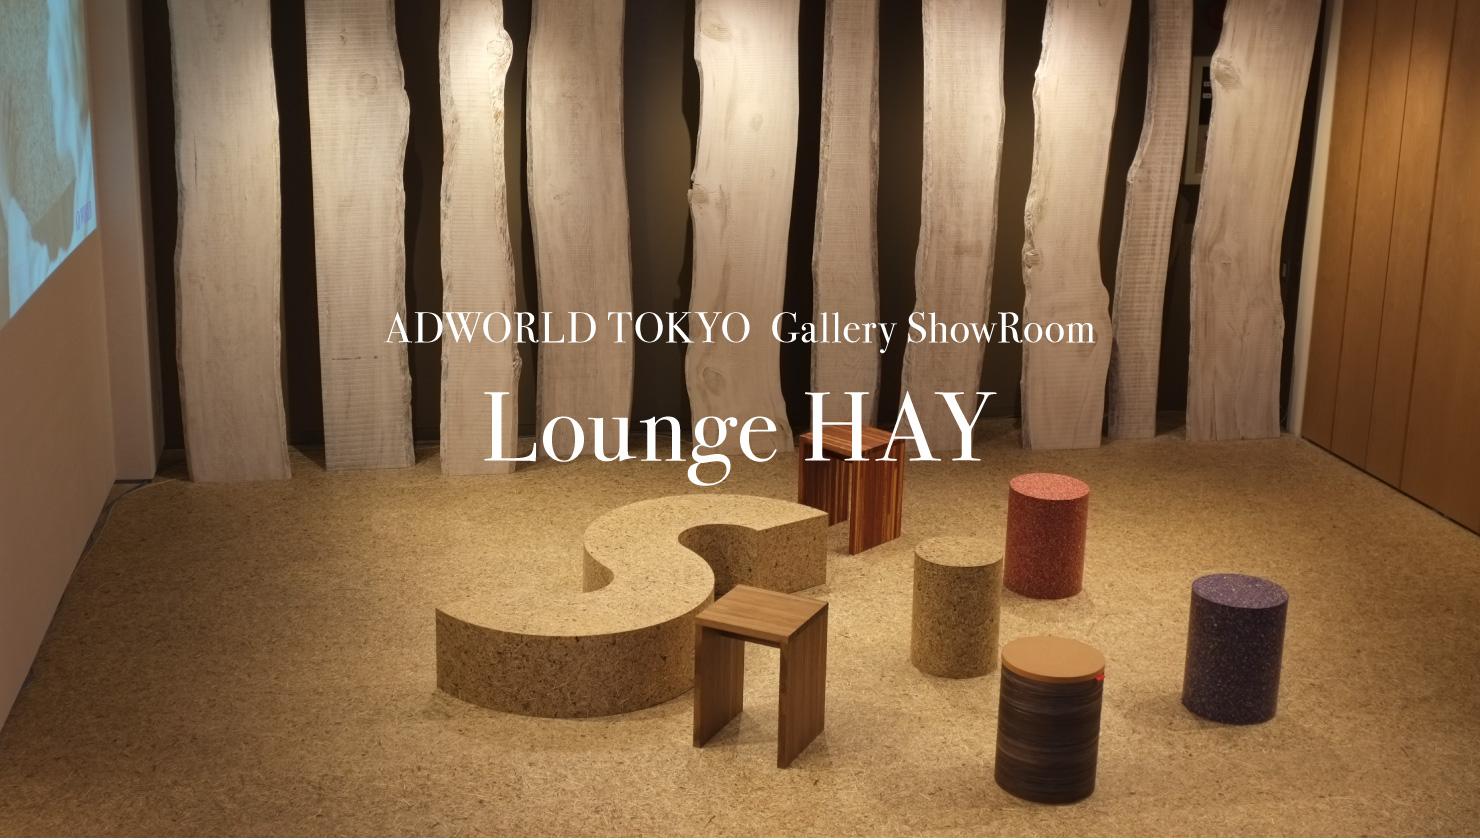 hydrocork ADWORLD TOKYO Gallery ShowRoom  Lounge HAY